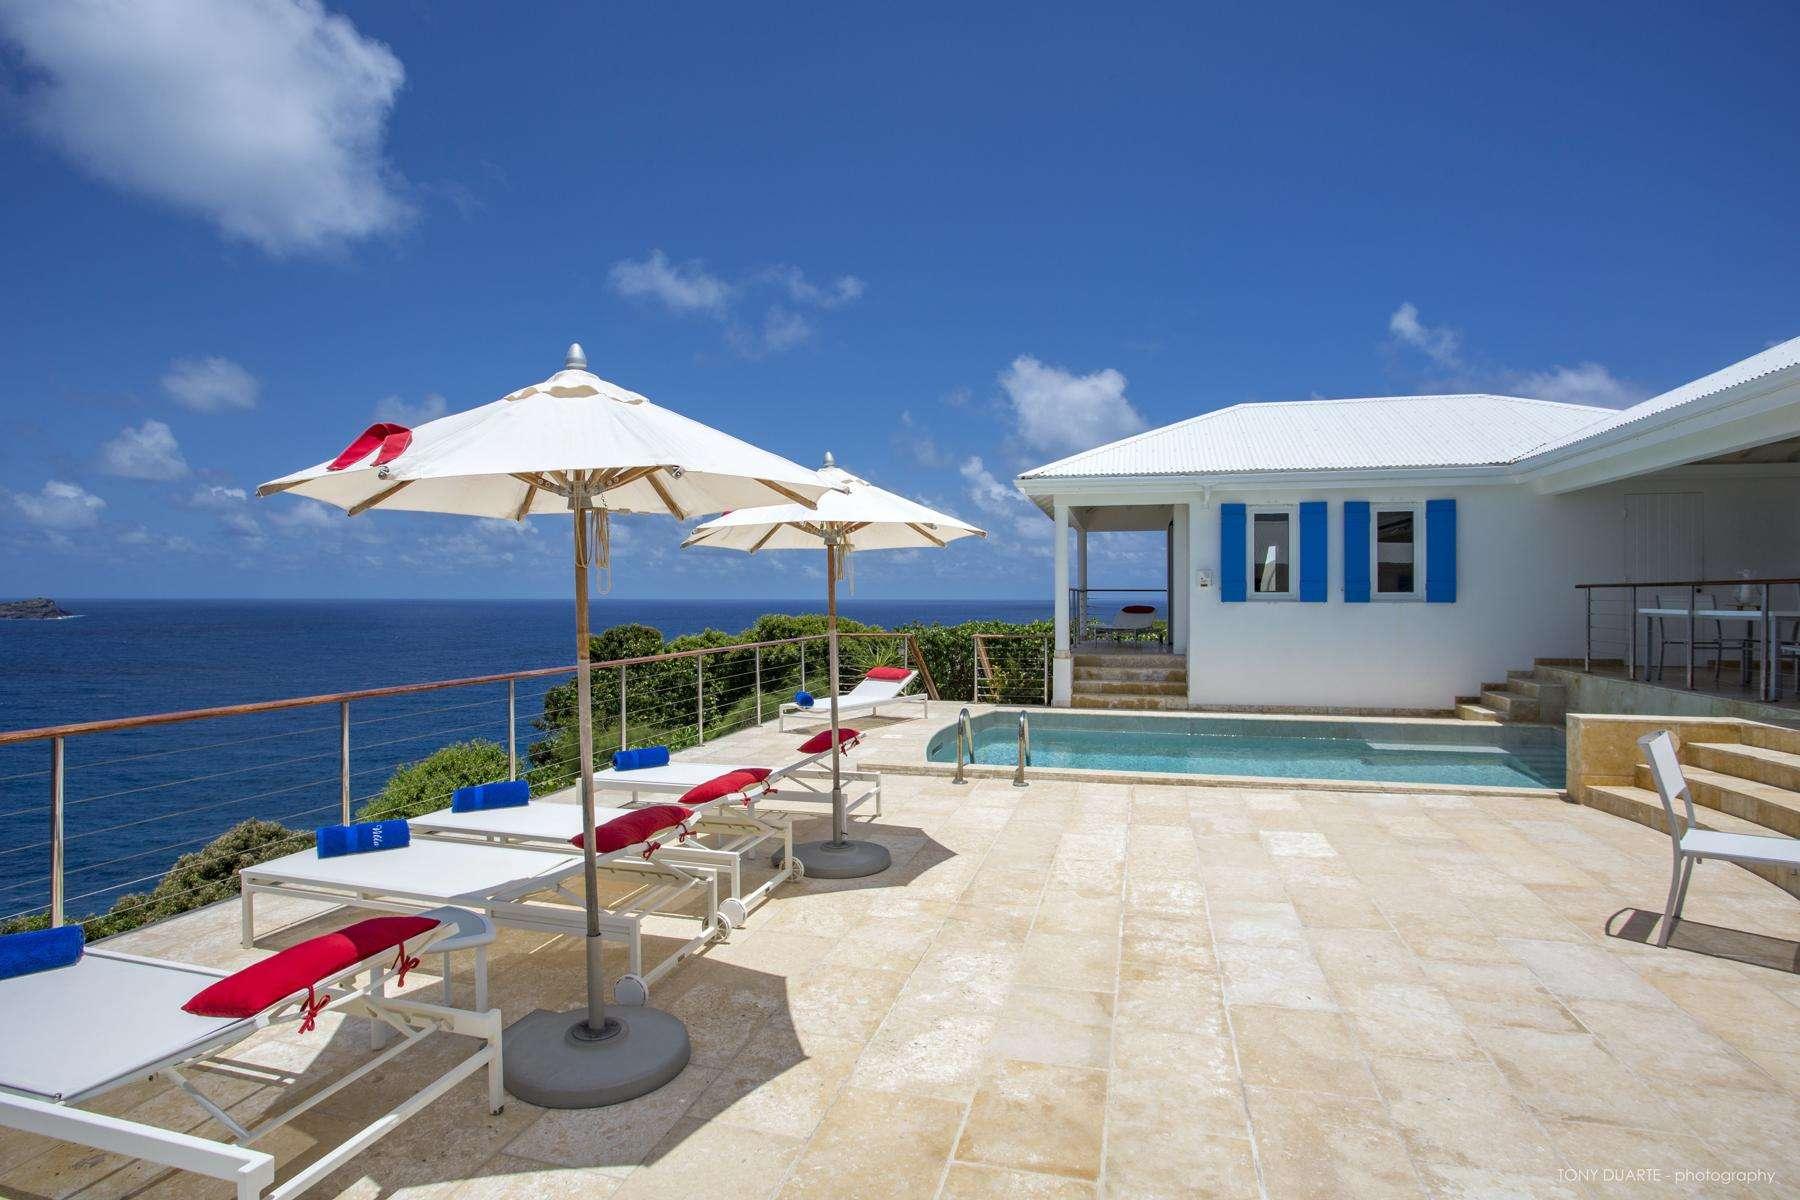 Luxury villa rentals caribbean - St barthelemy - Pointe milou - No location 4 - Day - Image 1/37